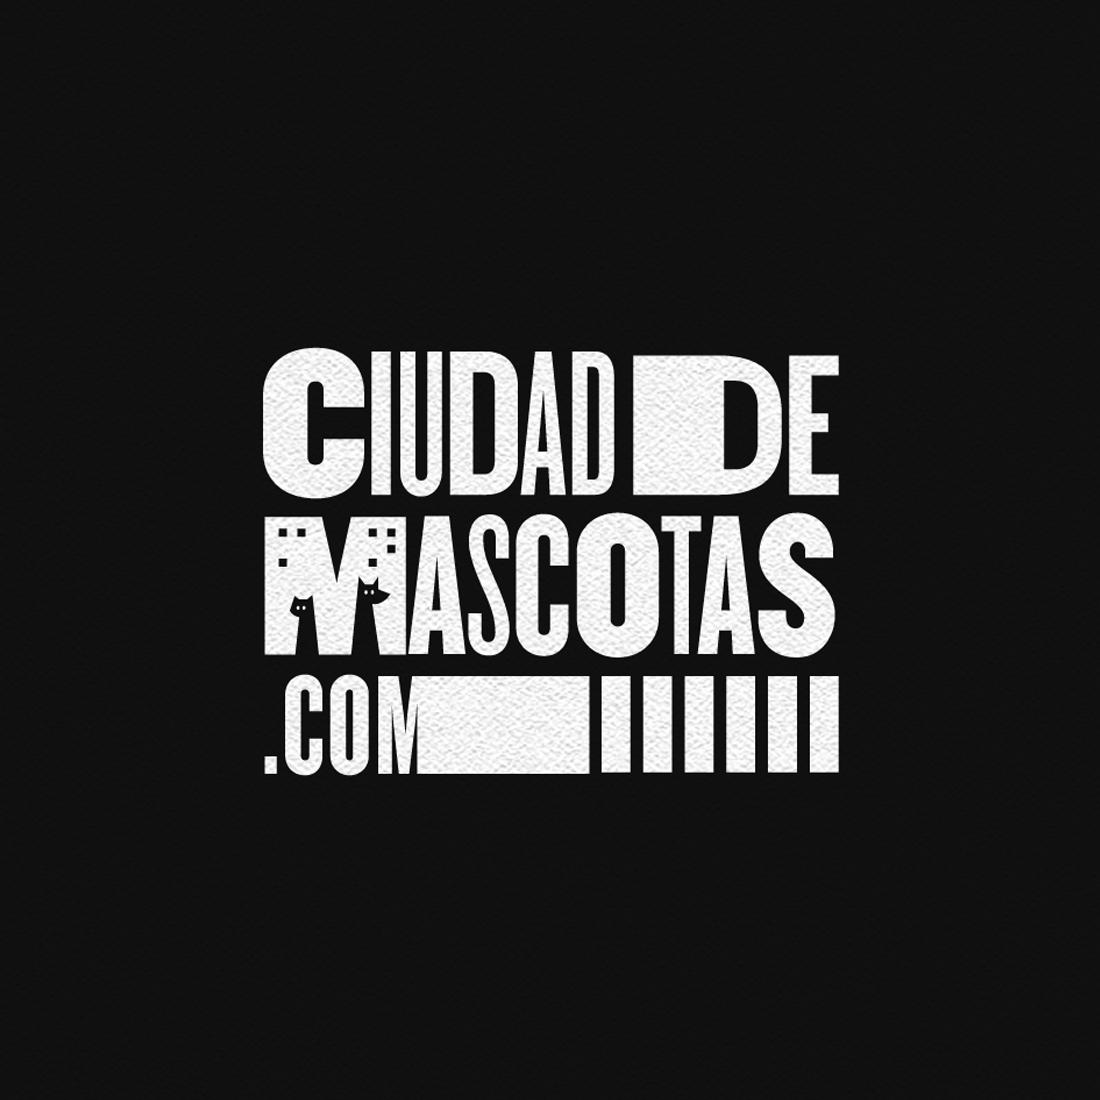 Rebranding for Pet Ecommerce Brand Ciudad de Mascotas